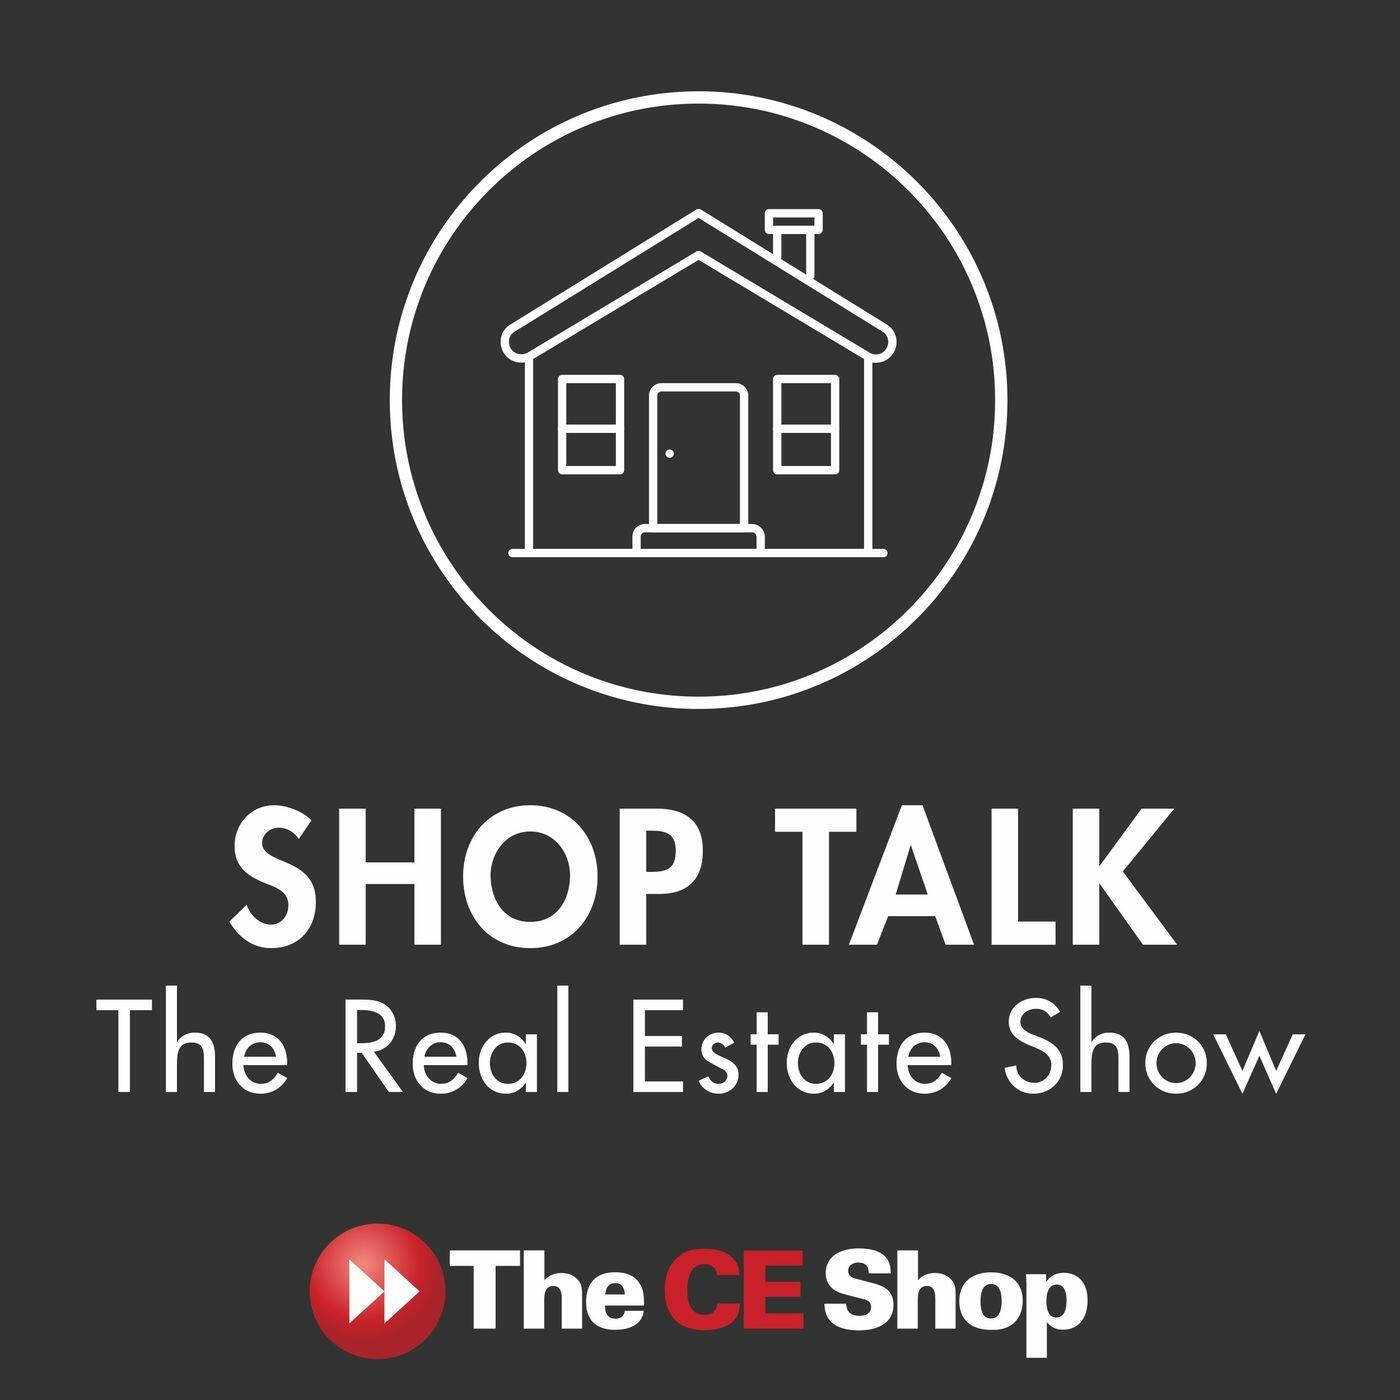 Shop Talk: The Real Estate Show